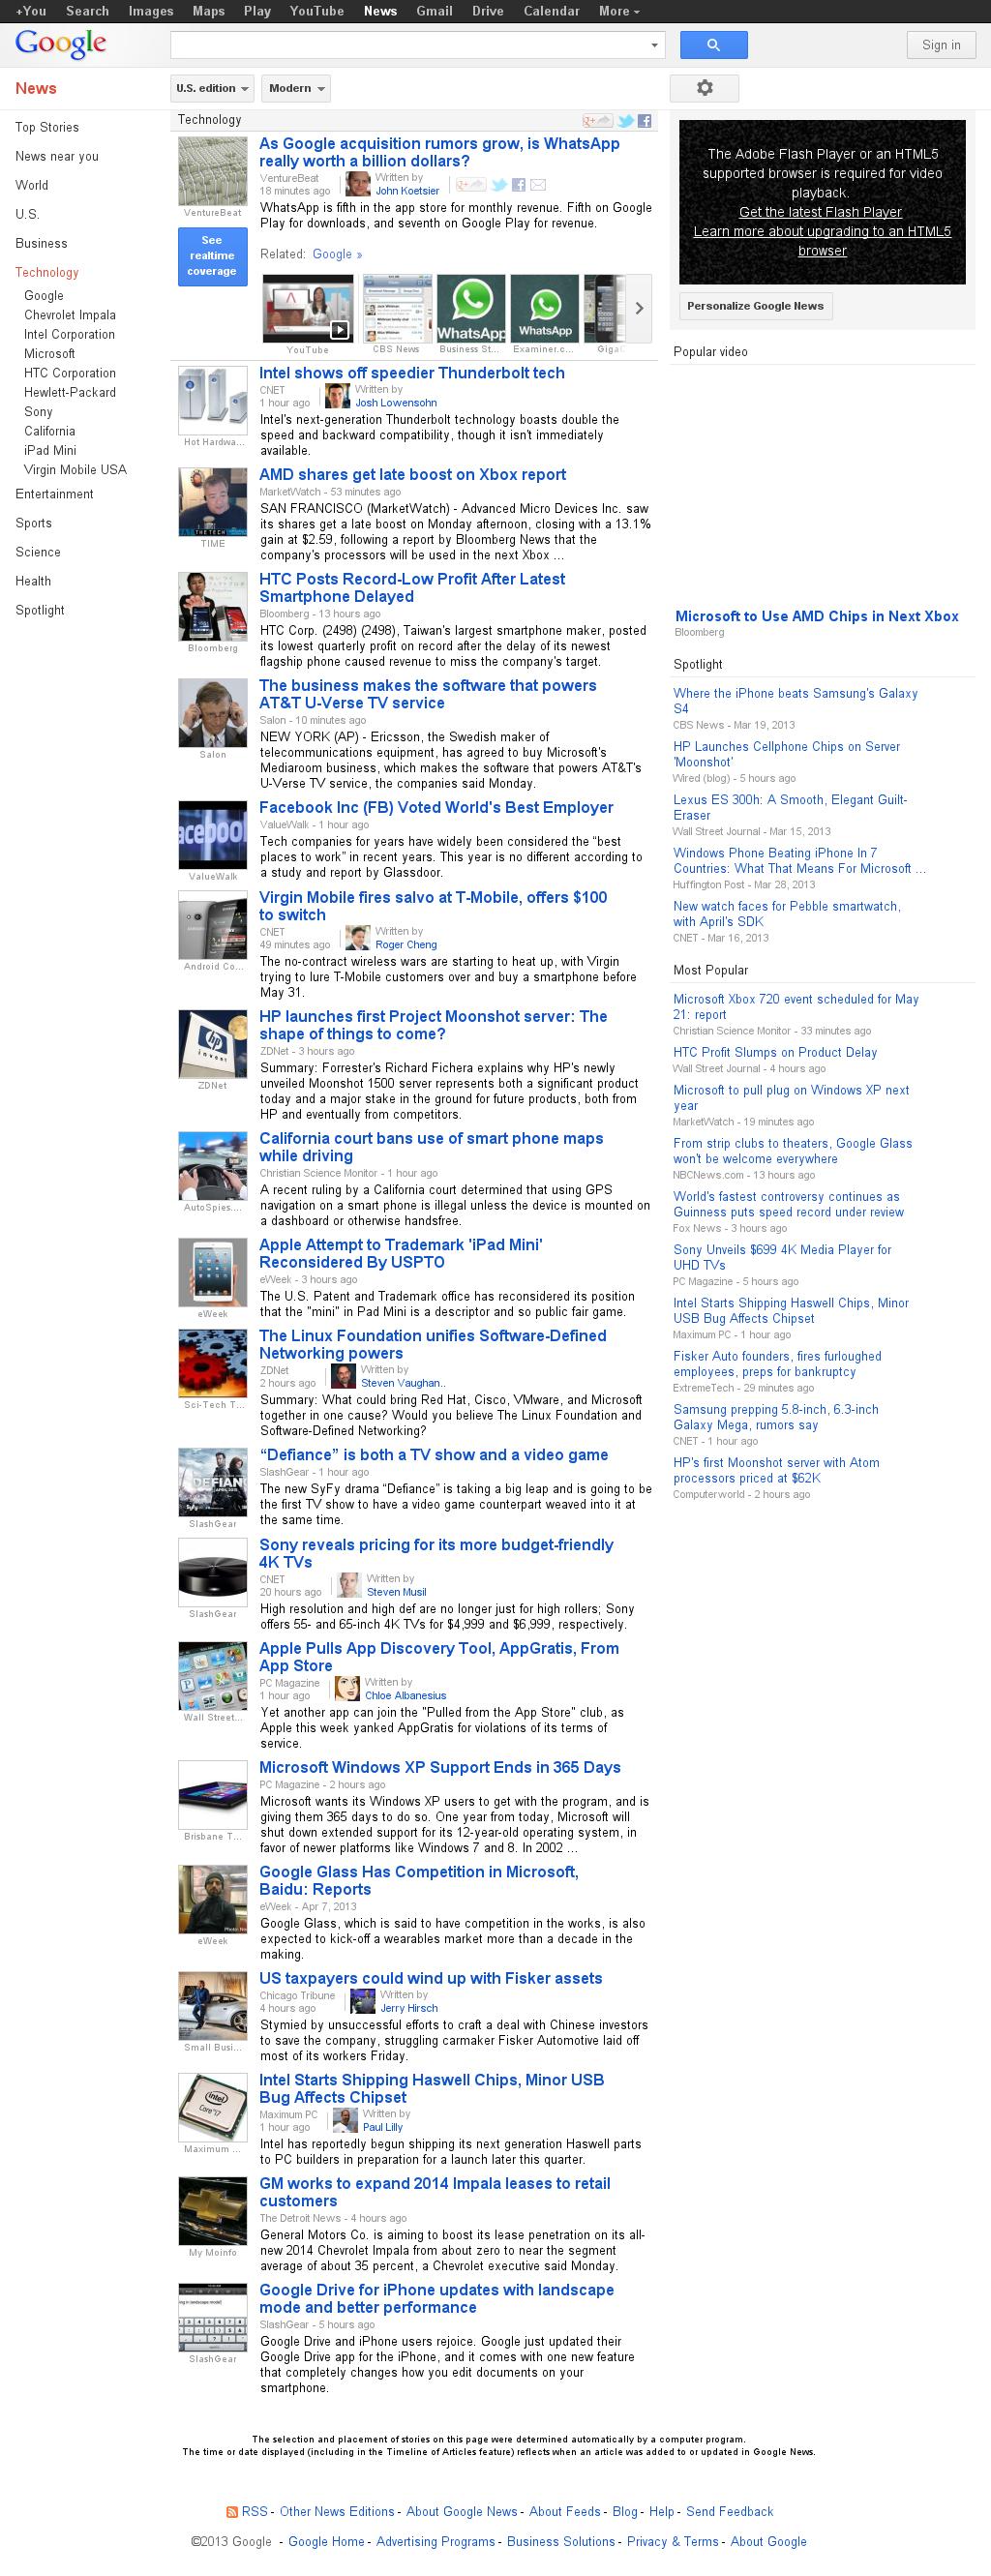 Google News: Technology at Monday April 8, 2013, 9:09 p.m. UTC